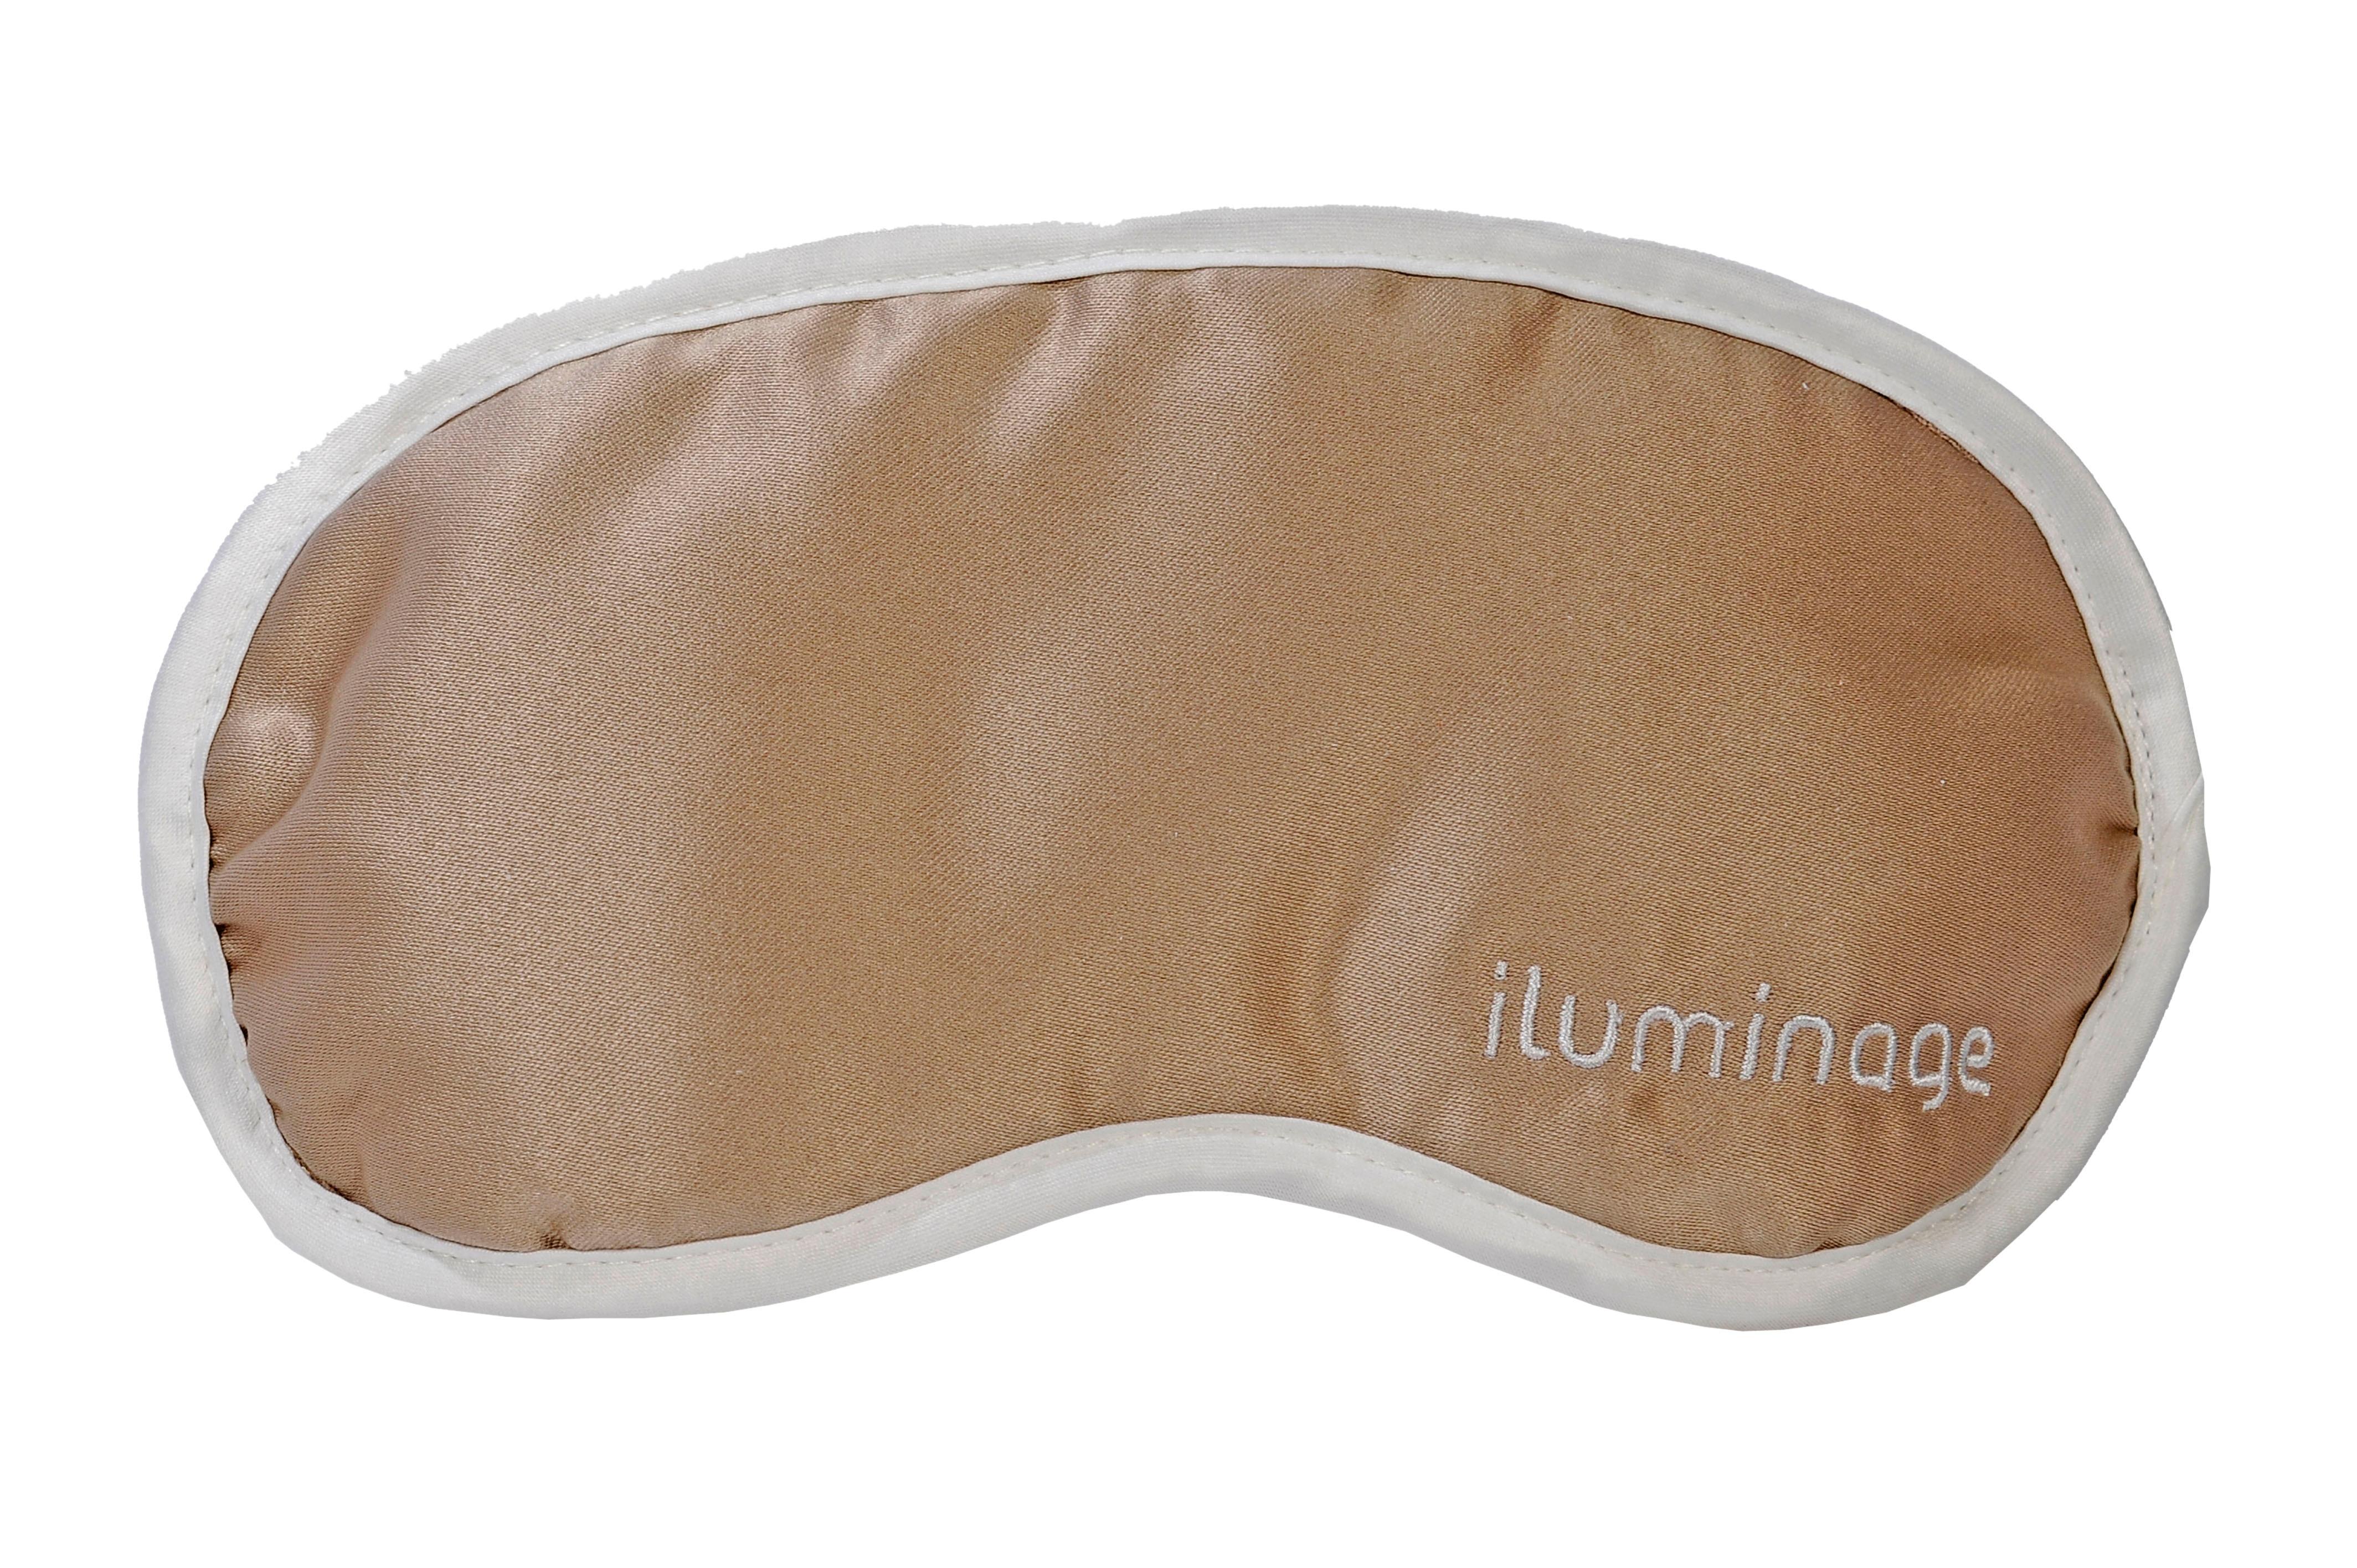 iluminage 3 pc Skin Rejuvenating EYE MASK PILLOWCASES w// COPPER OXIDE *NEW